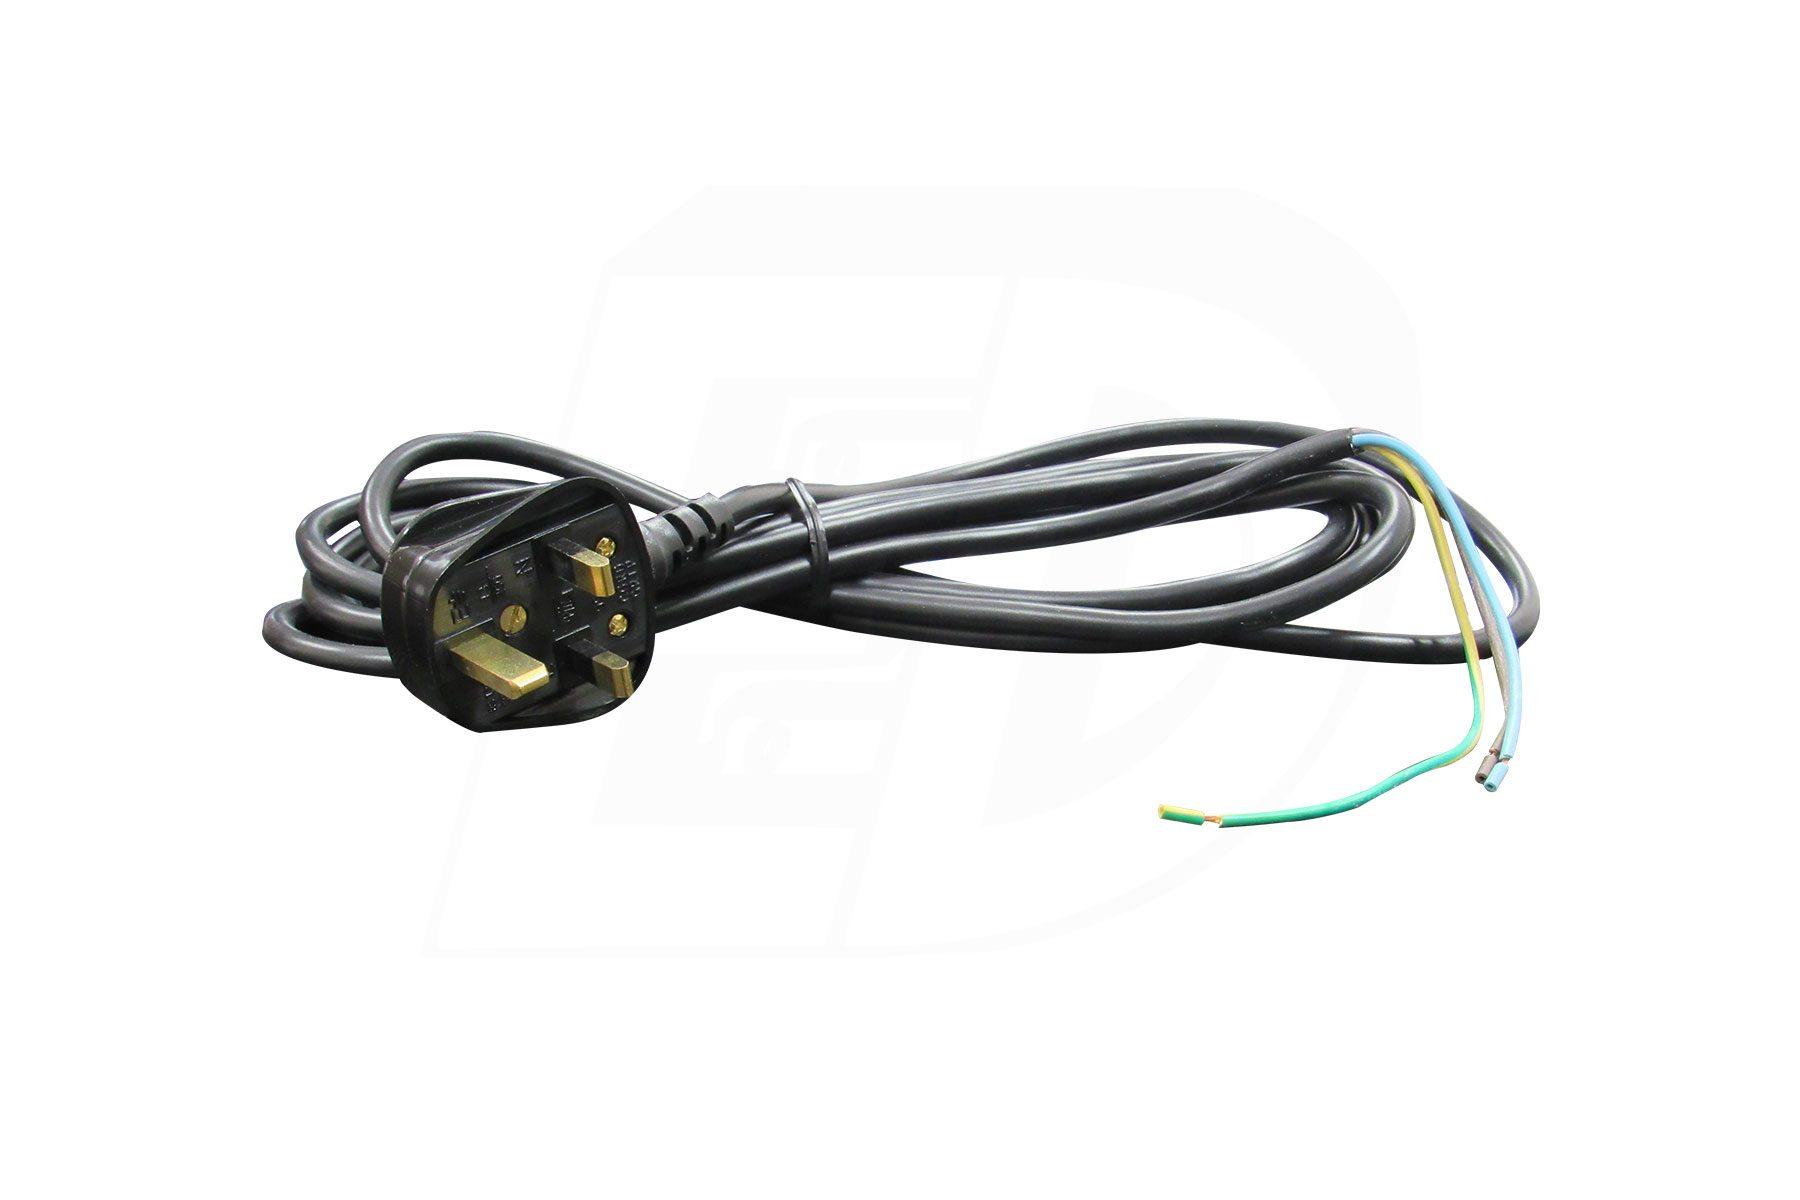 H05WF AC Power Cord